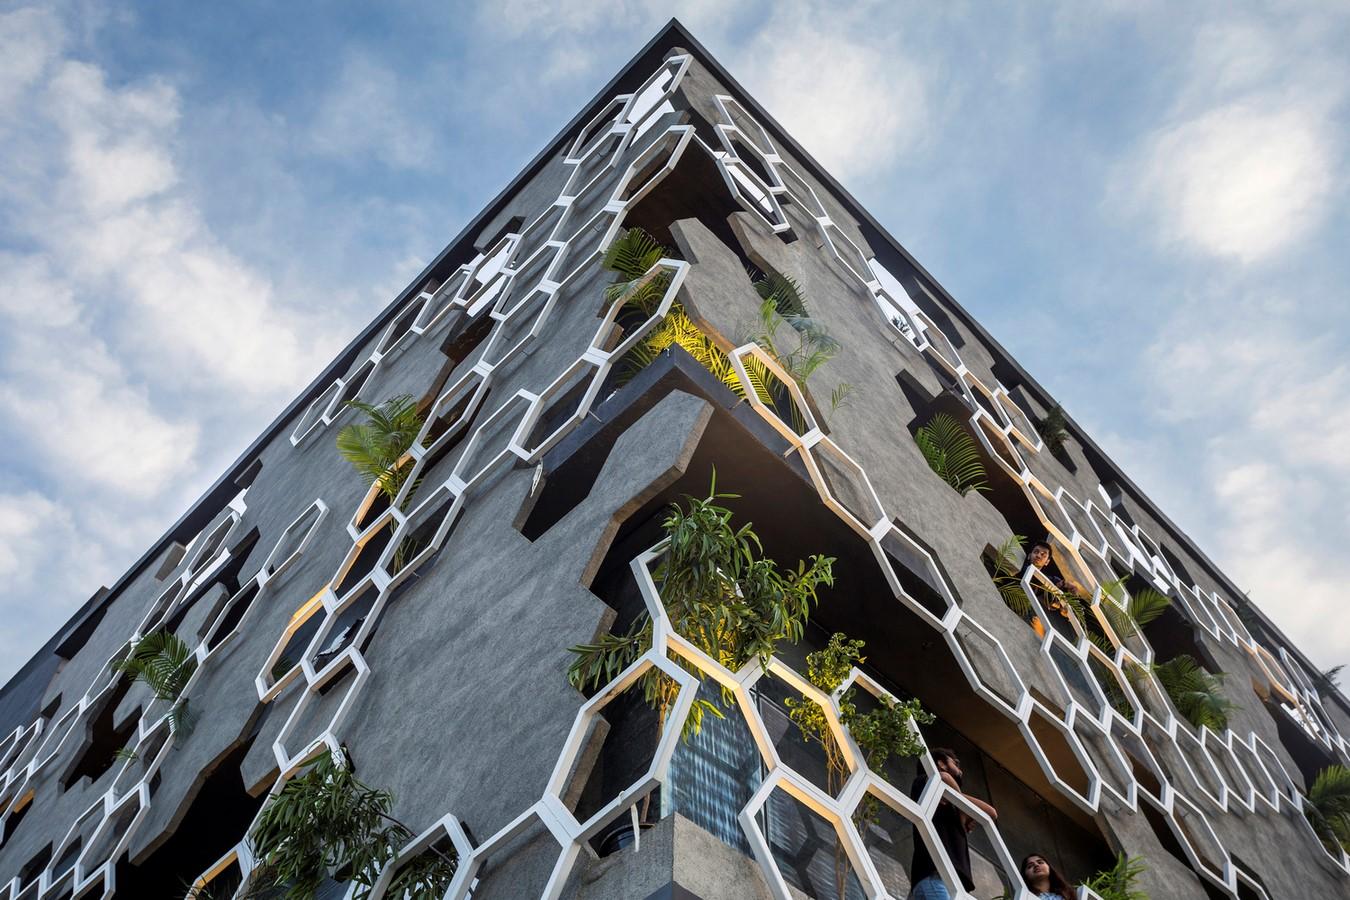 10 Examples of Innovative facade design solutions - Sheet29